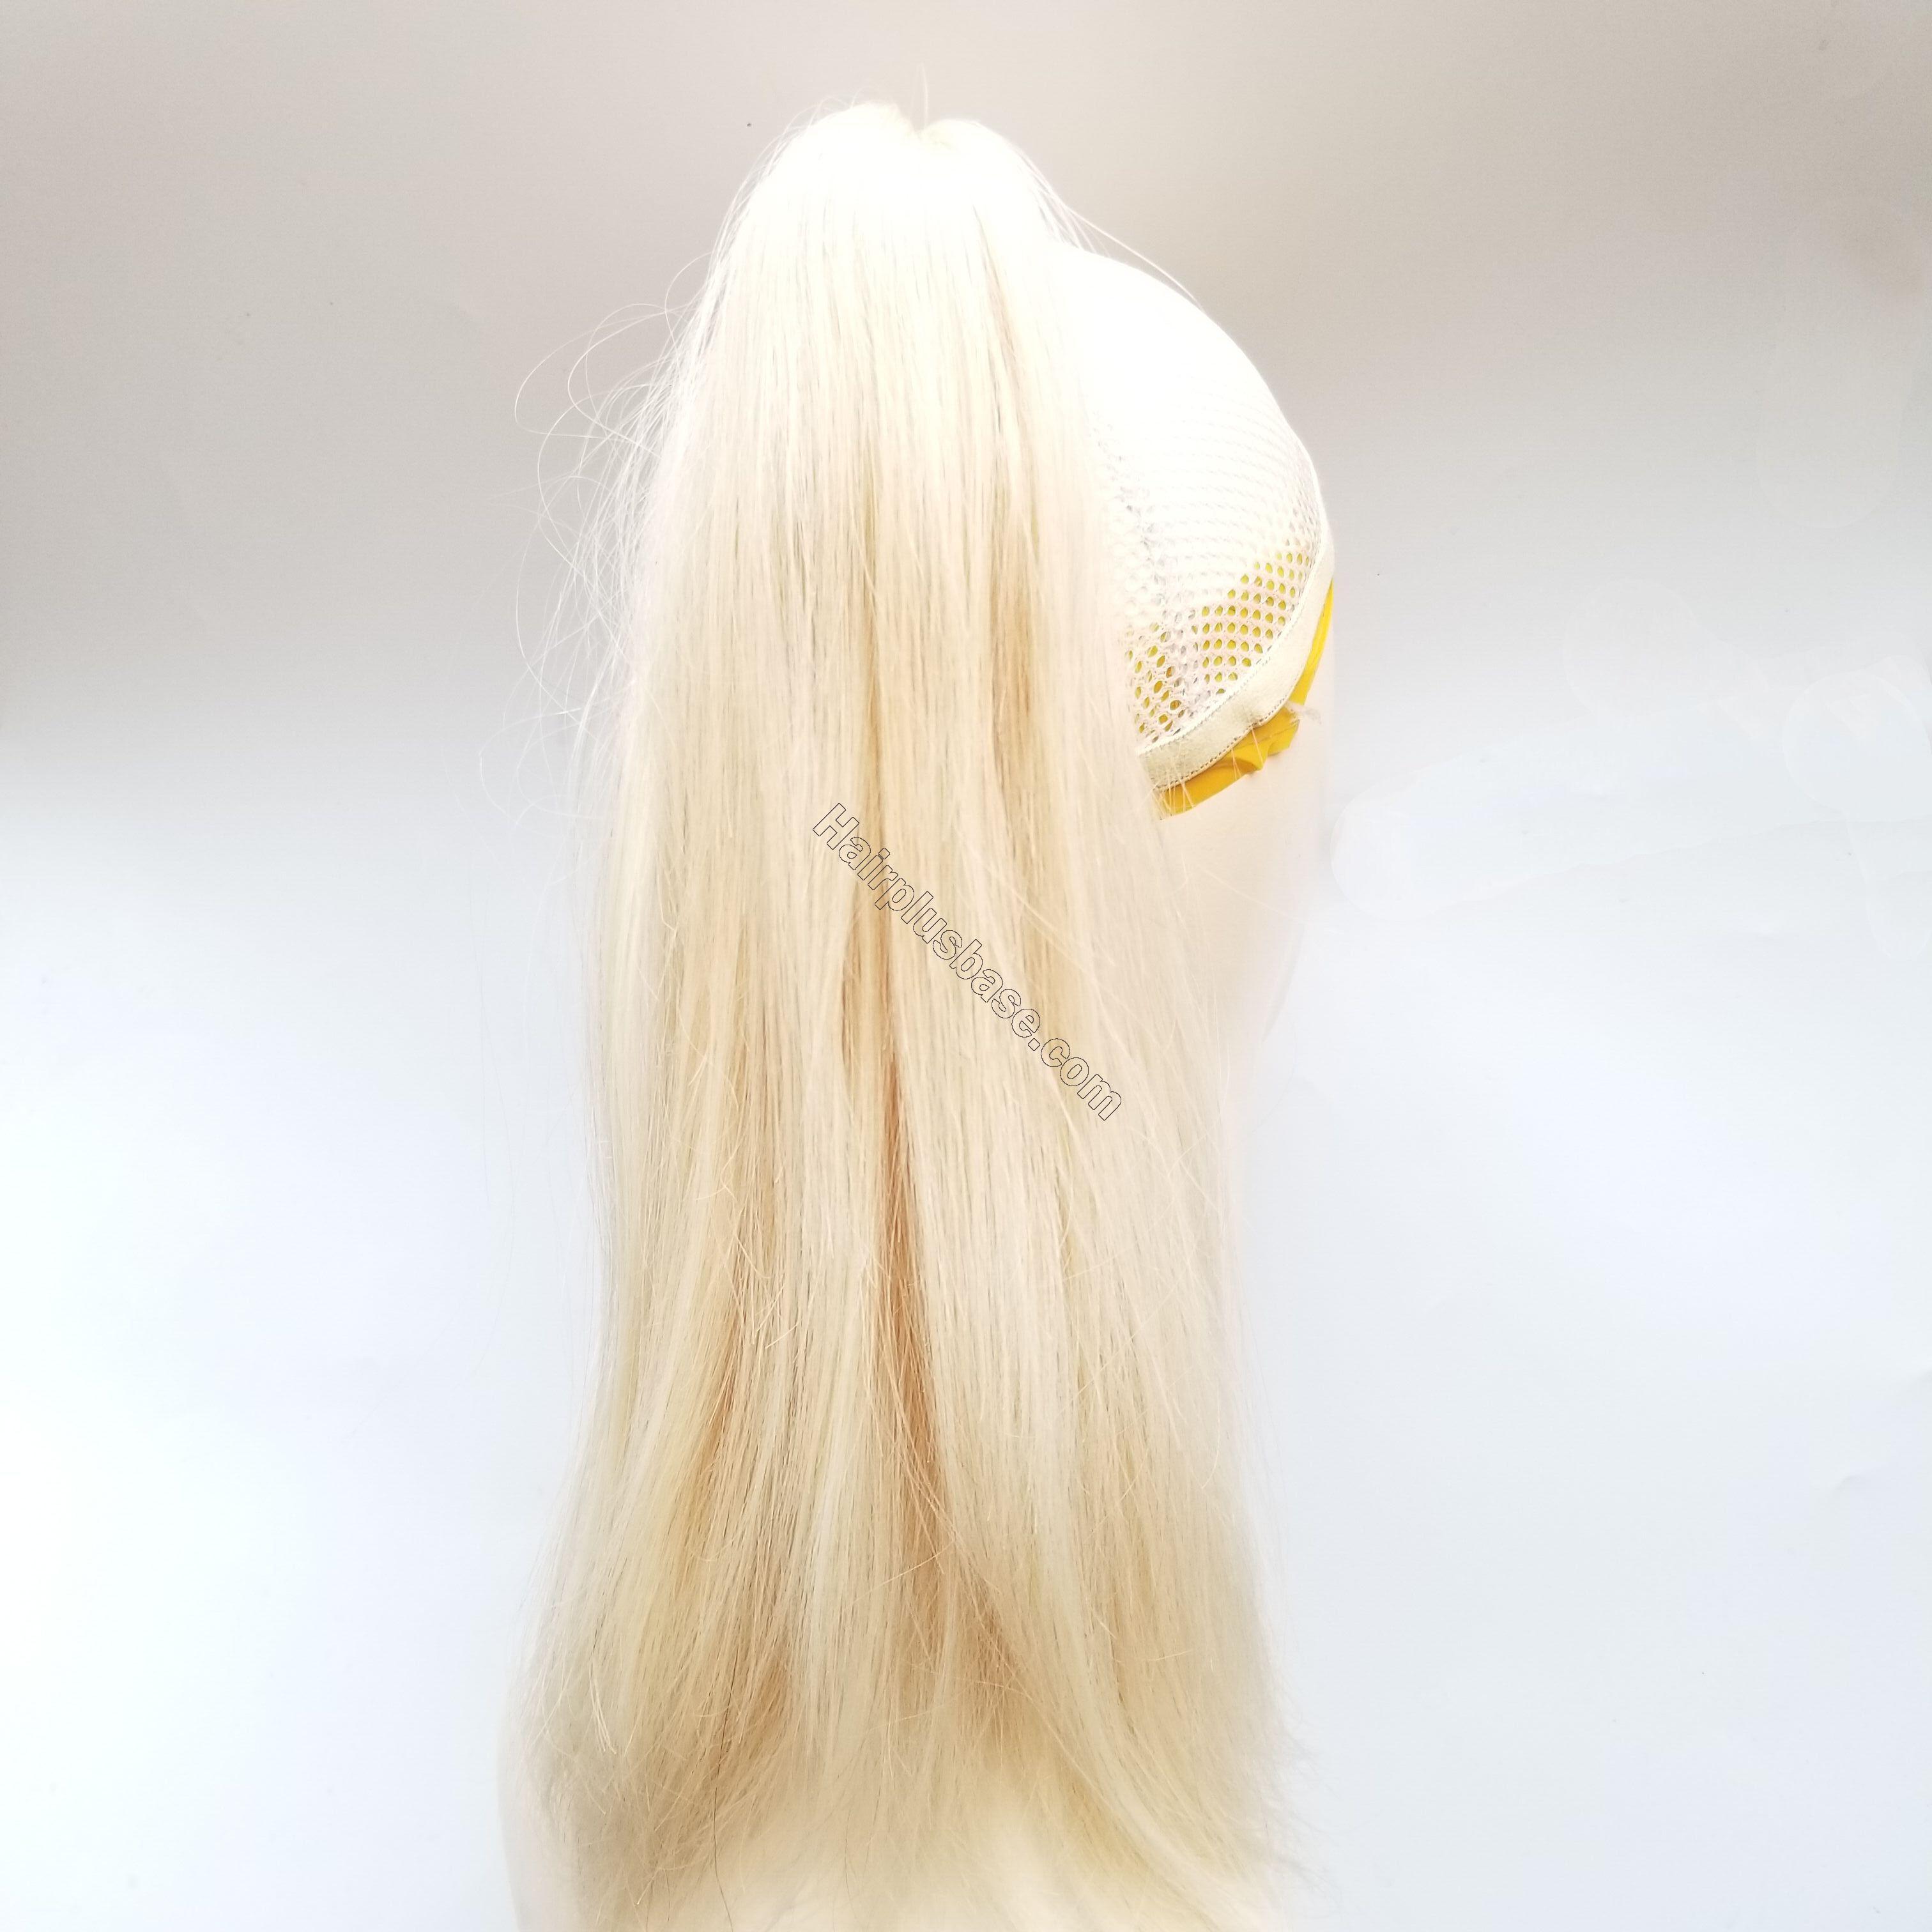 8 - 30 Inch Claw Ponytail Extension Human Hair #613 Bleach Blonde 4